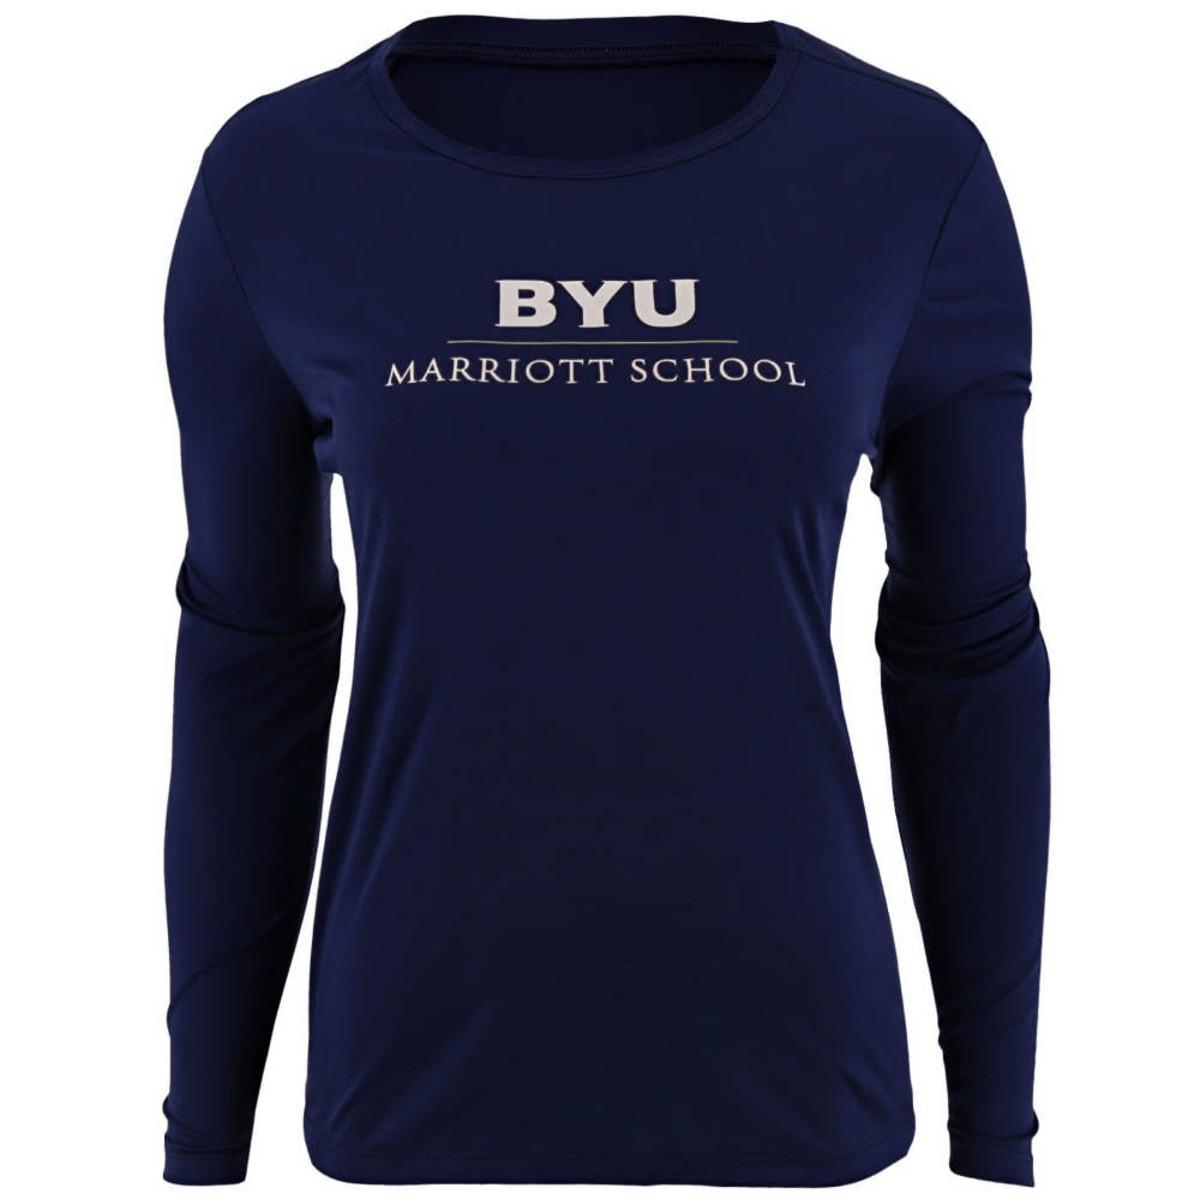 Byu Marriott School